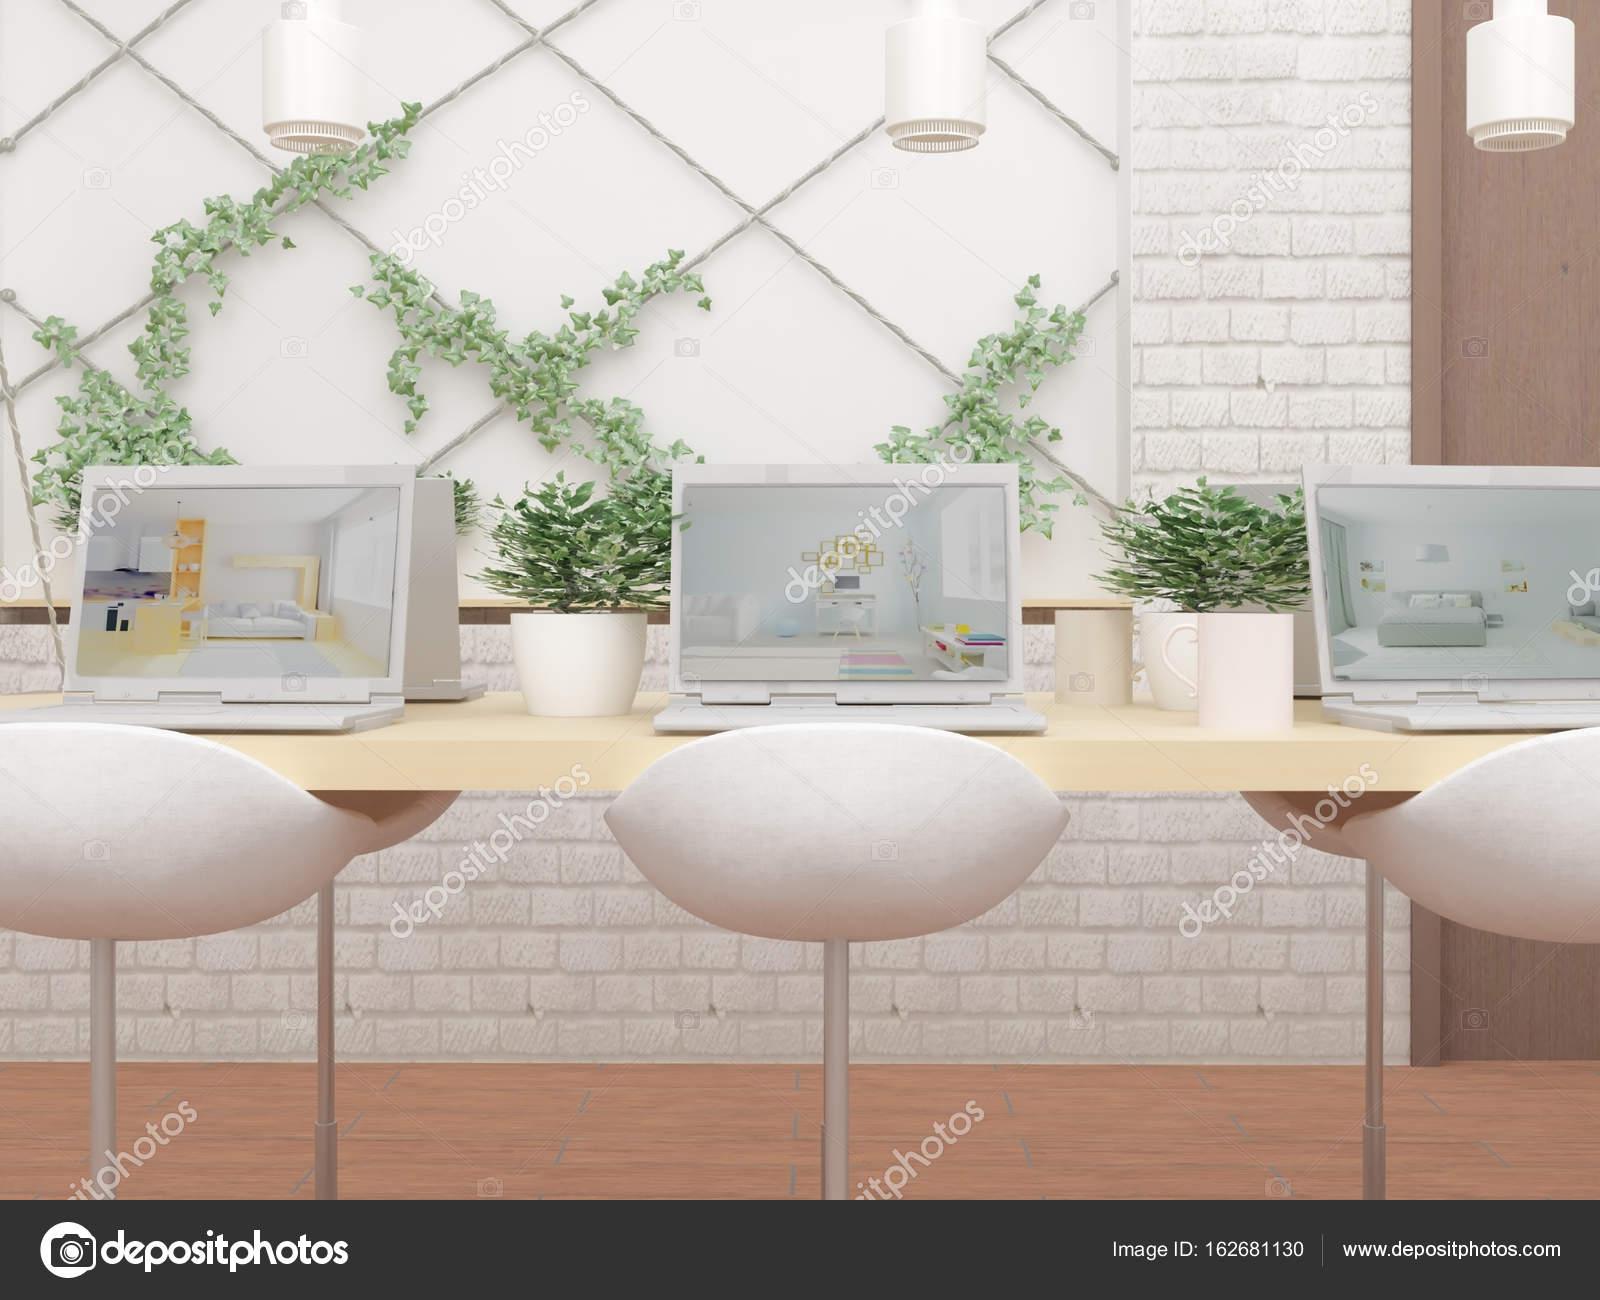 Computers op de tuinset groene planten u stockfoto lisunova